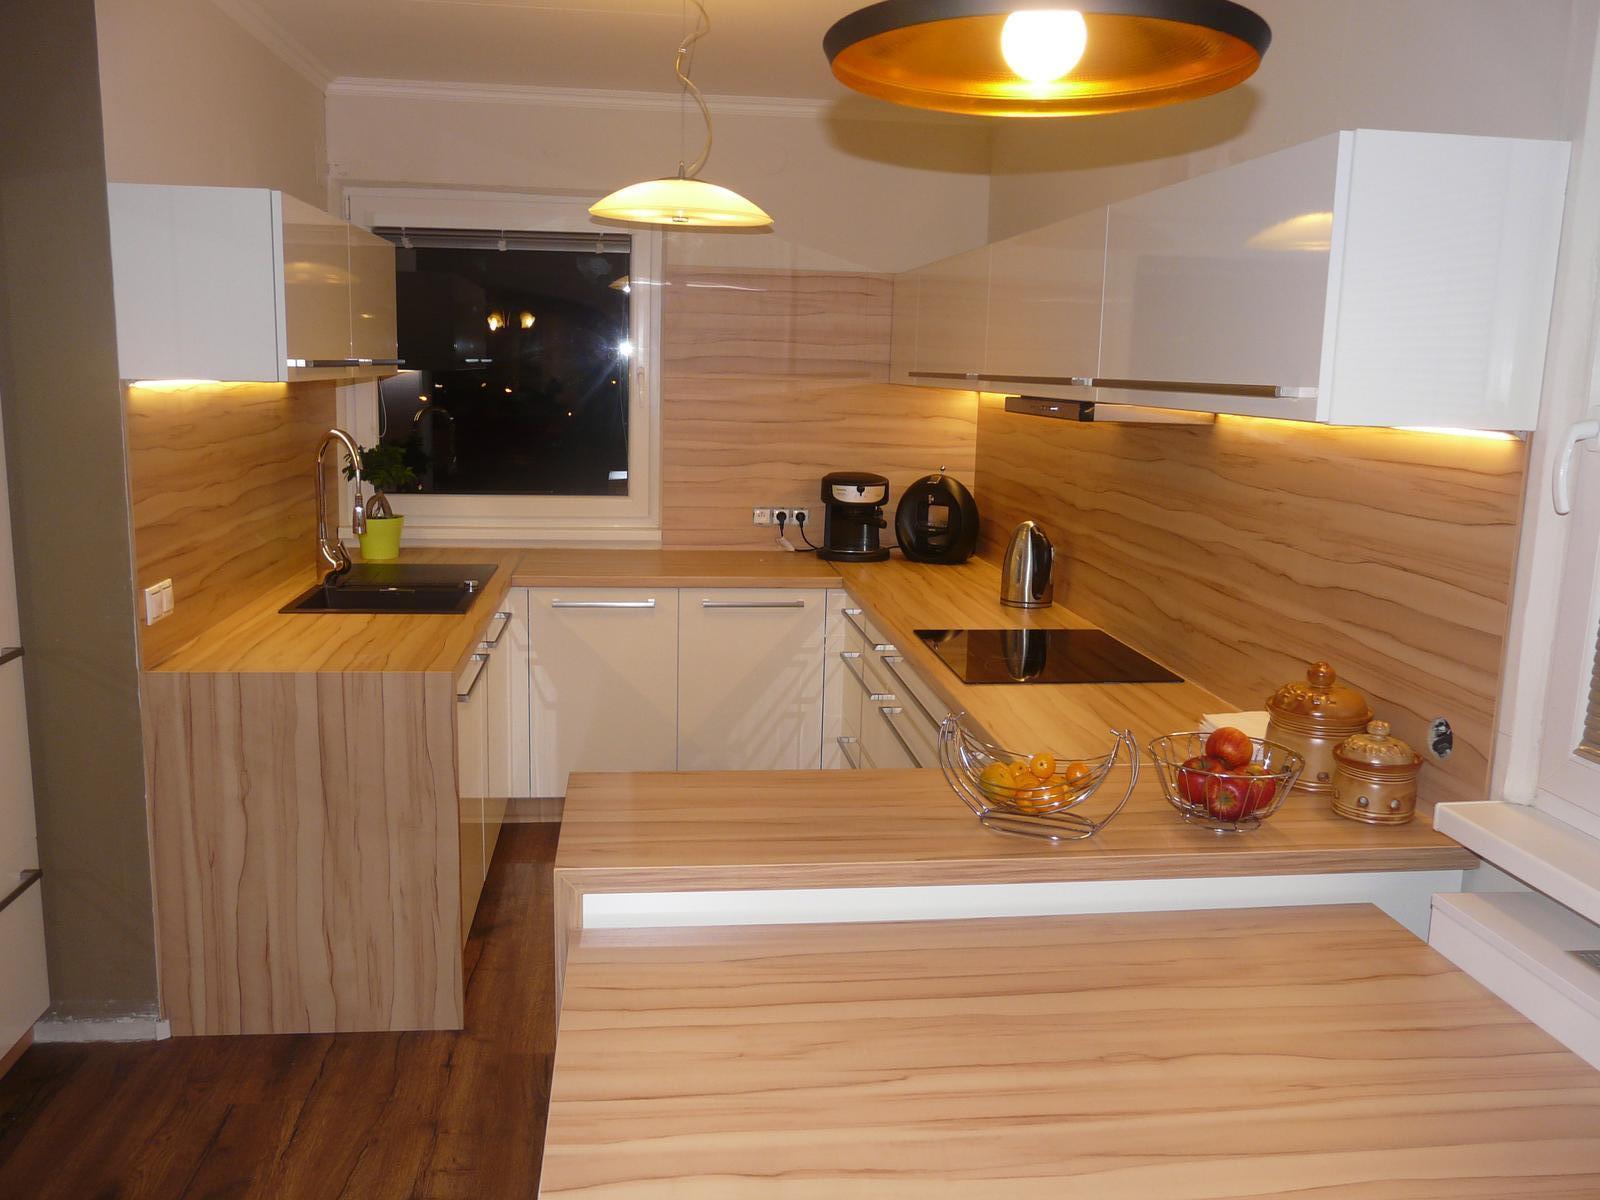 Kuchyna RK prve foto - Obrázok č. 4